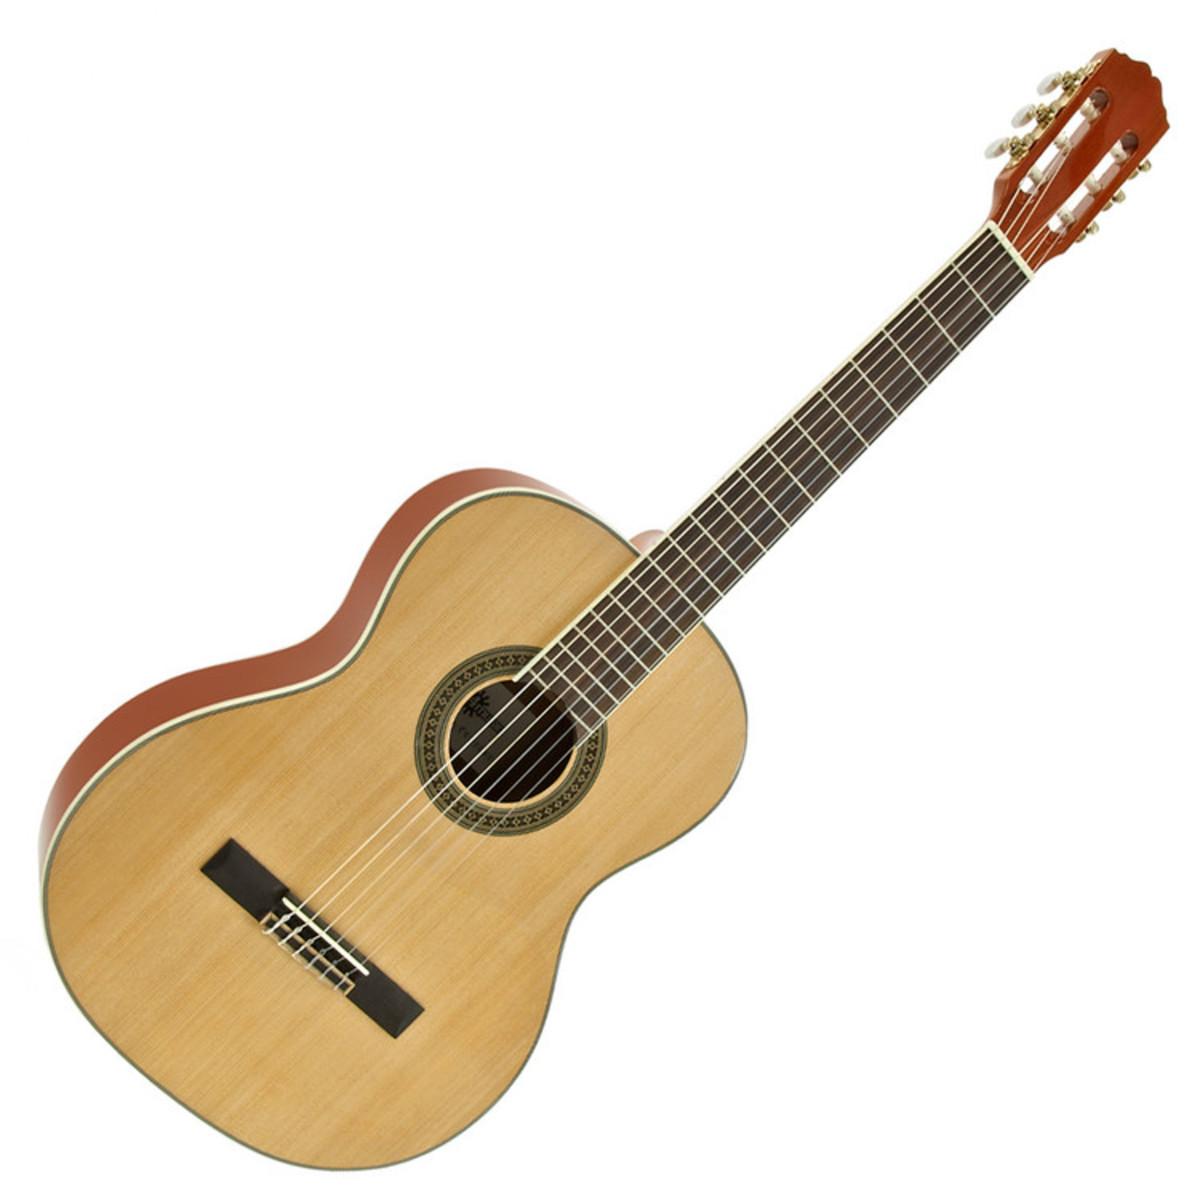 guitare classique deluxe par gear4music comme neuf. Black Bedroom Furniture Sets. Home Design Ideas